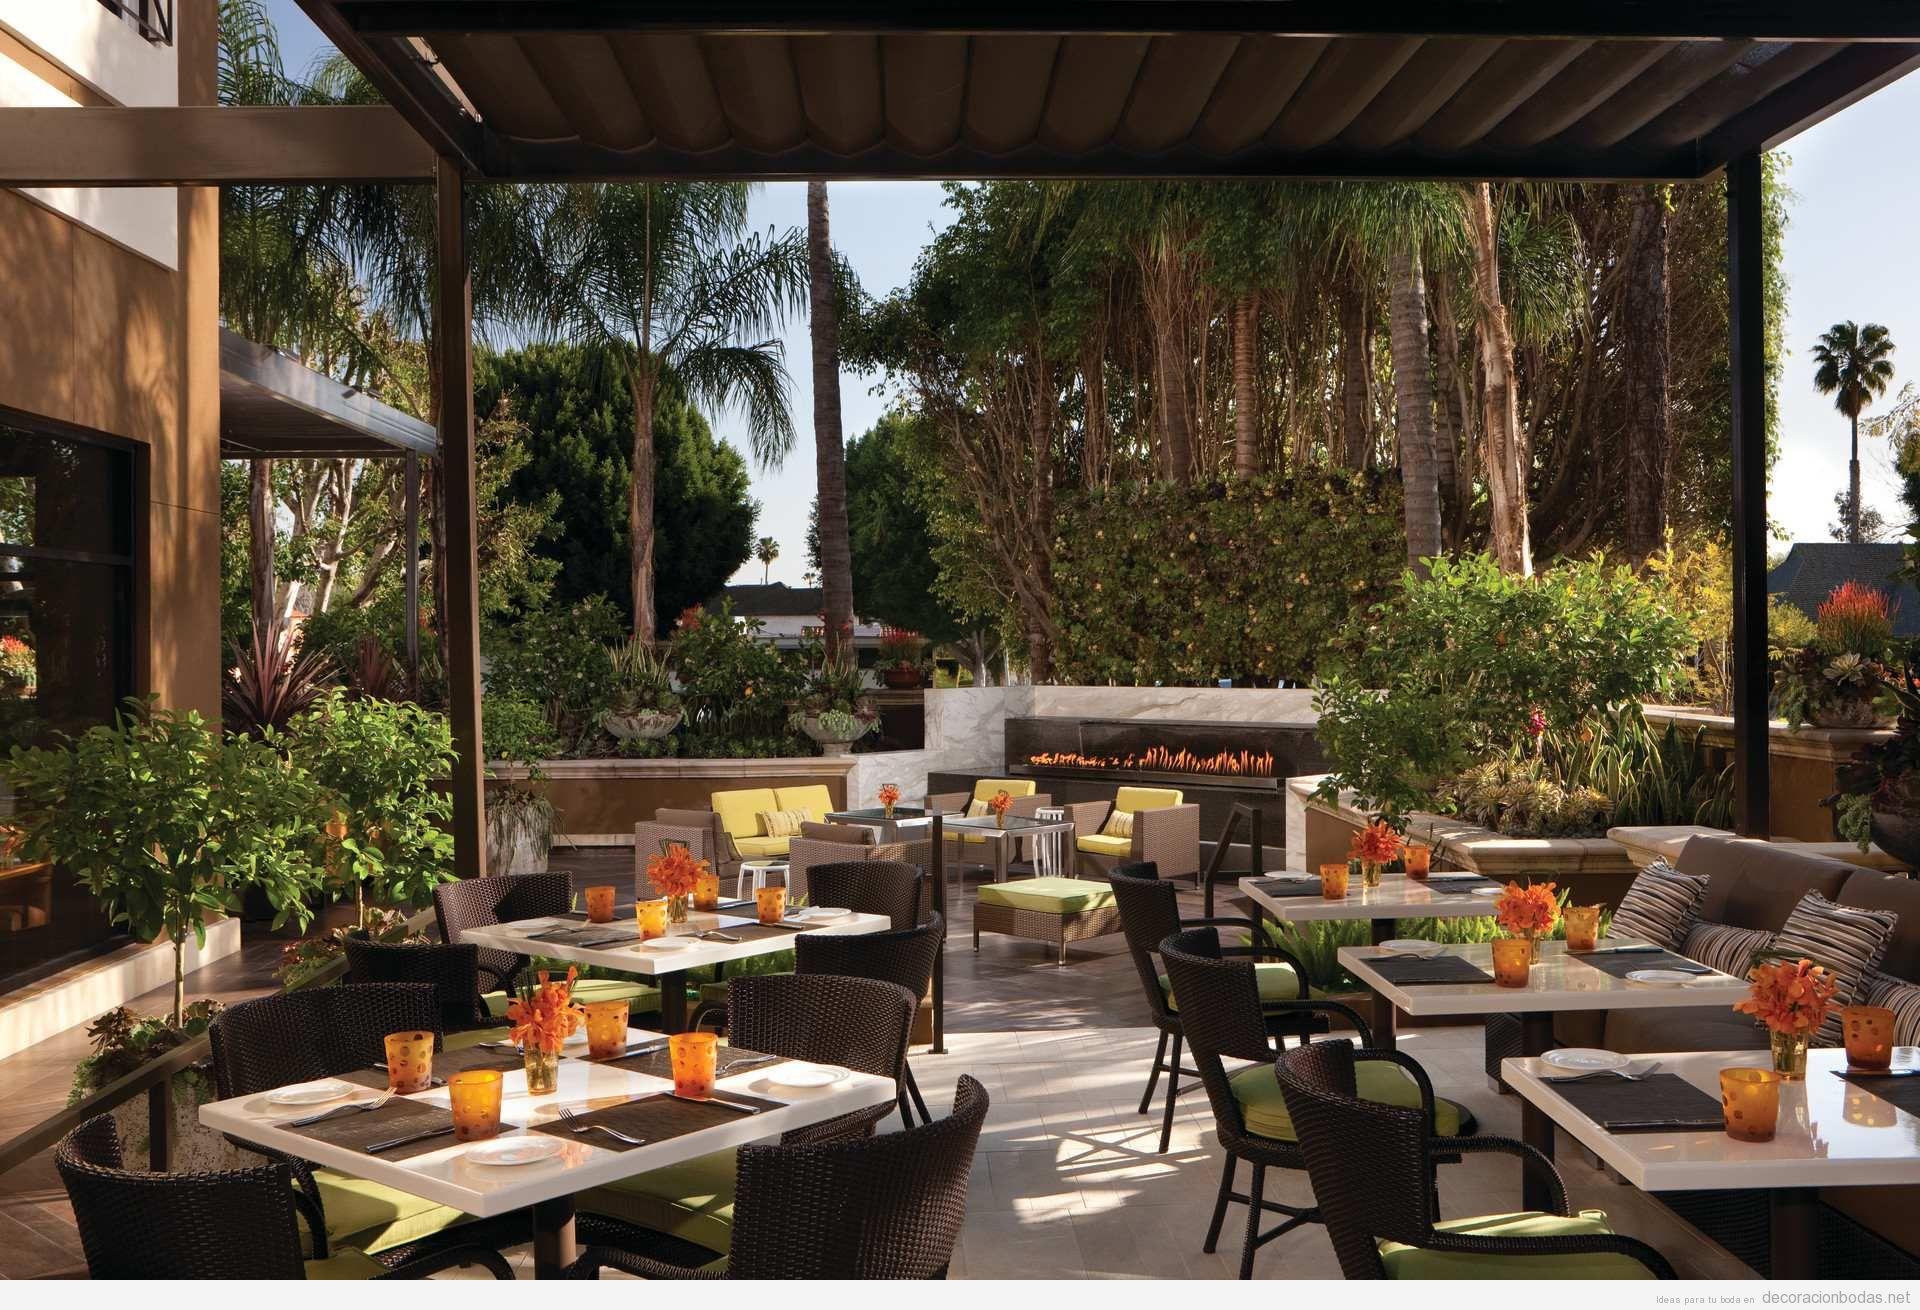 Diseno Exterior Restaurante Minimalista Terraza